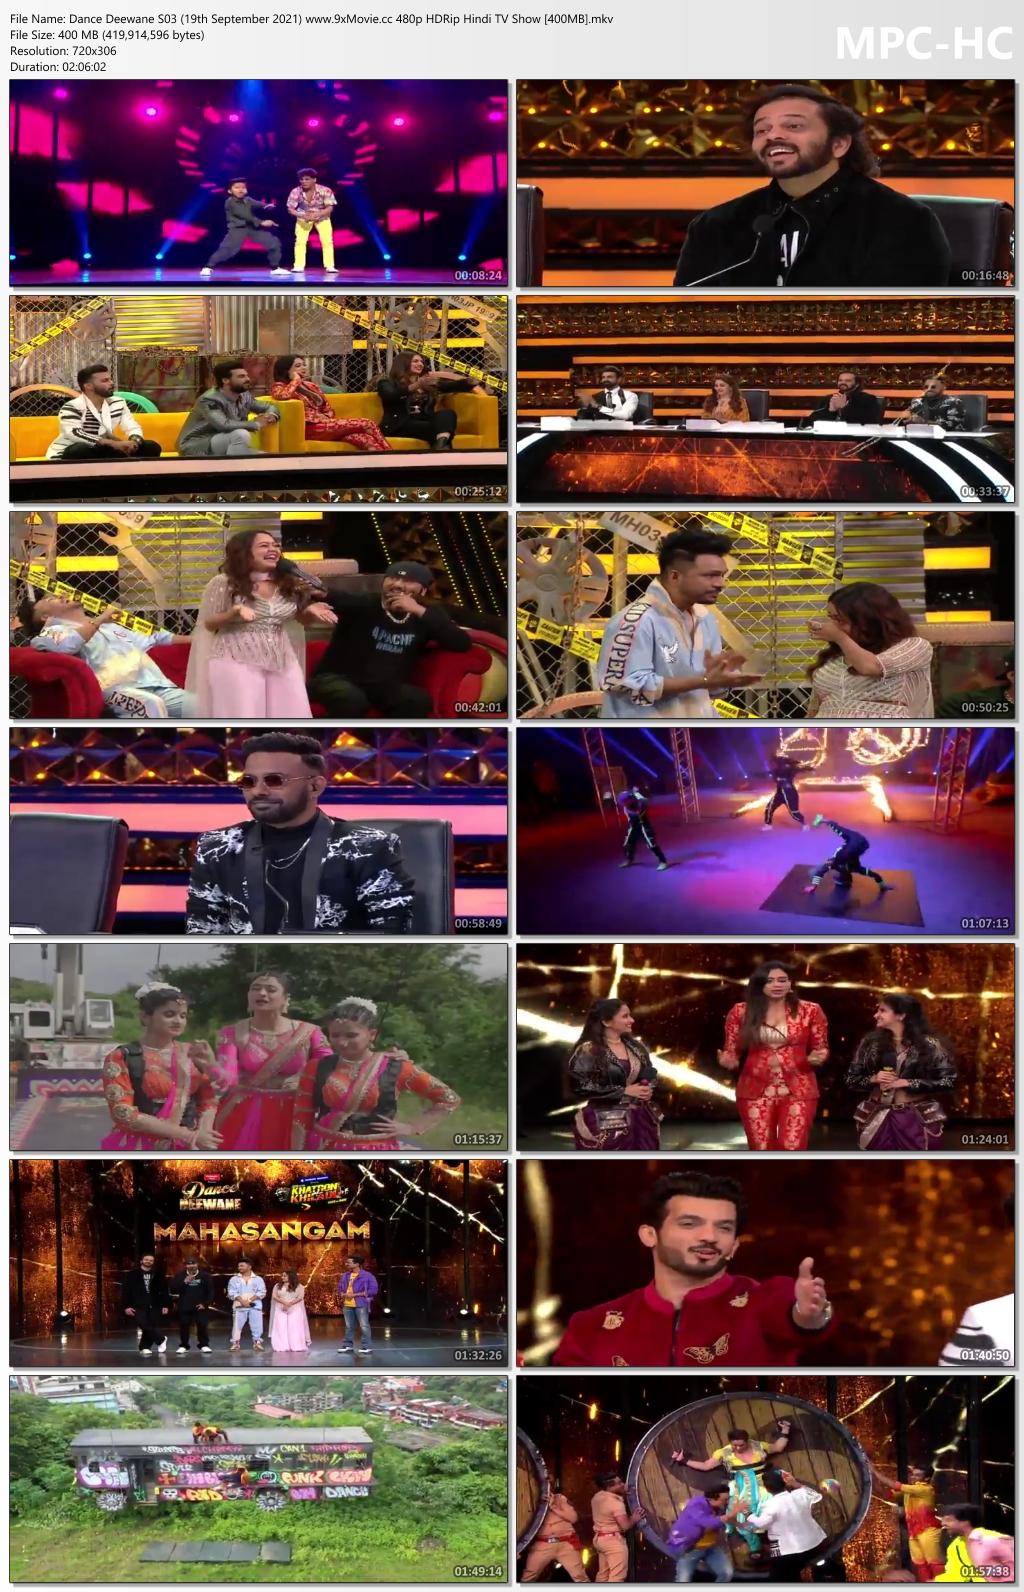 Dance-Deewane-S03-19th-September-2021-www-9x-Movie-cc-480p-HDRip-Hindi-TV-Show-400-MB-mkv